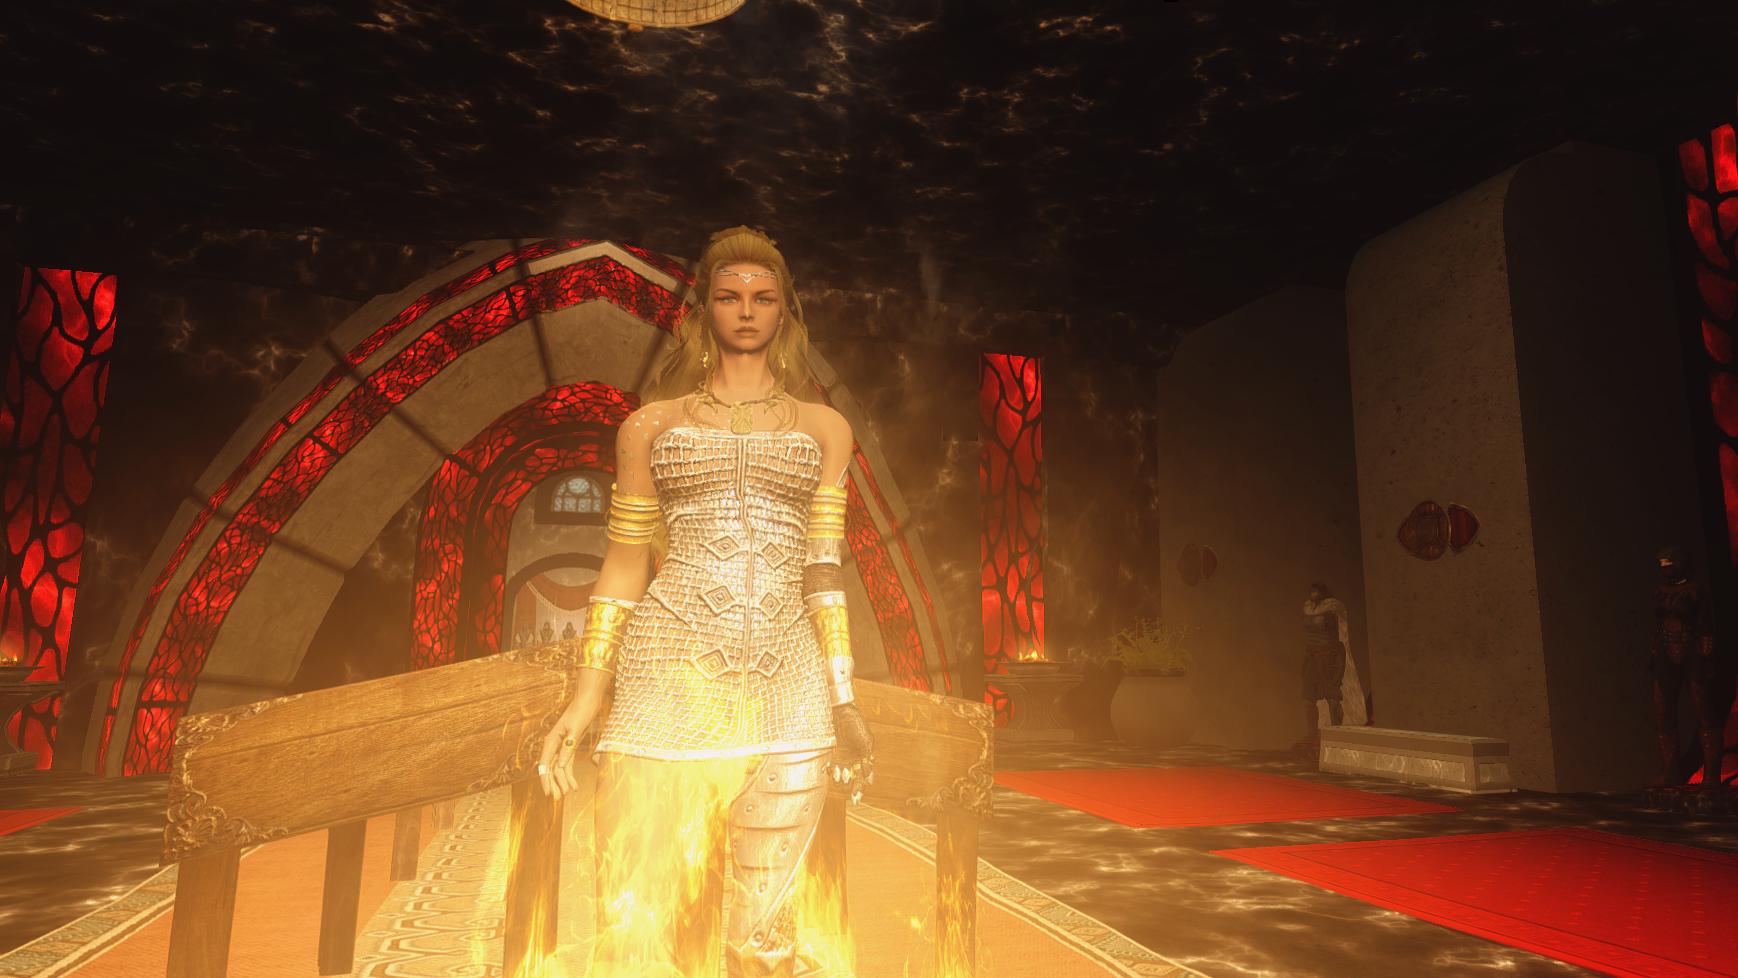 Desktop Screenshot 2019.10.18 - 17.07.14.79.png - Elder Scrolls 5: Skyrim, the